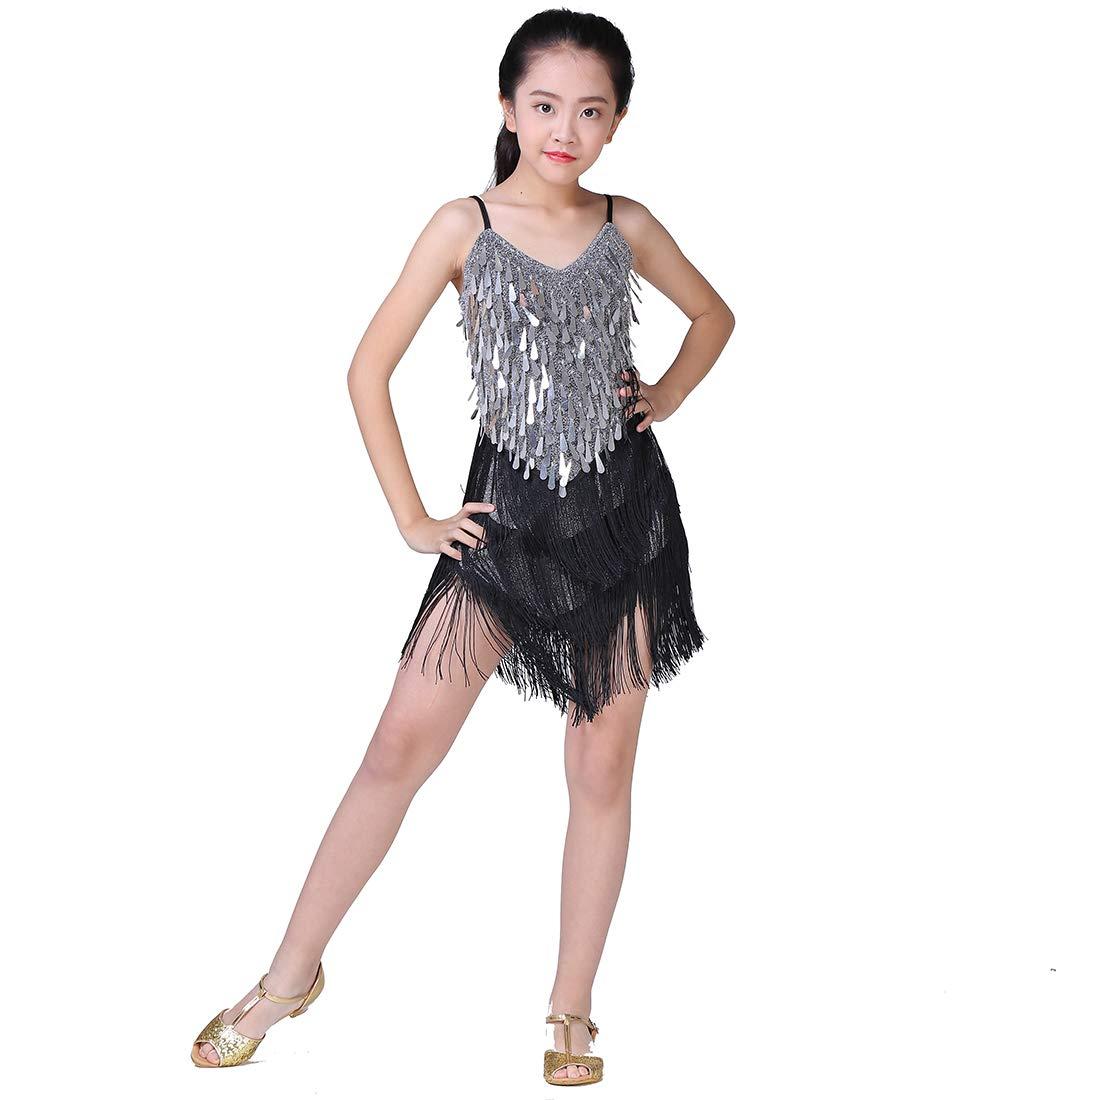 238417619cc8 Amazon.com: Magogo Girls Dancing Dresses, Sequin Tassel Skirt Latin Dance  Costumes for Kids, Salsa Ballet Tango Rumba Ballroom Dancewear: Clothing